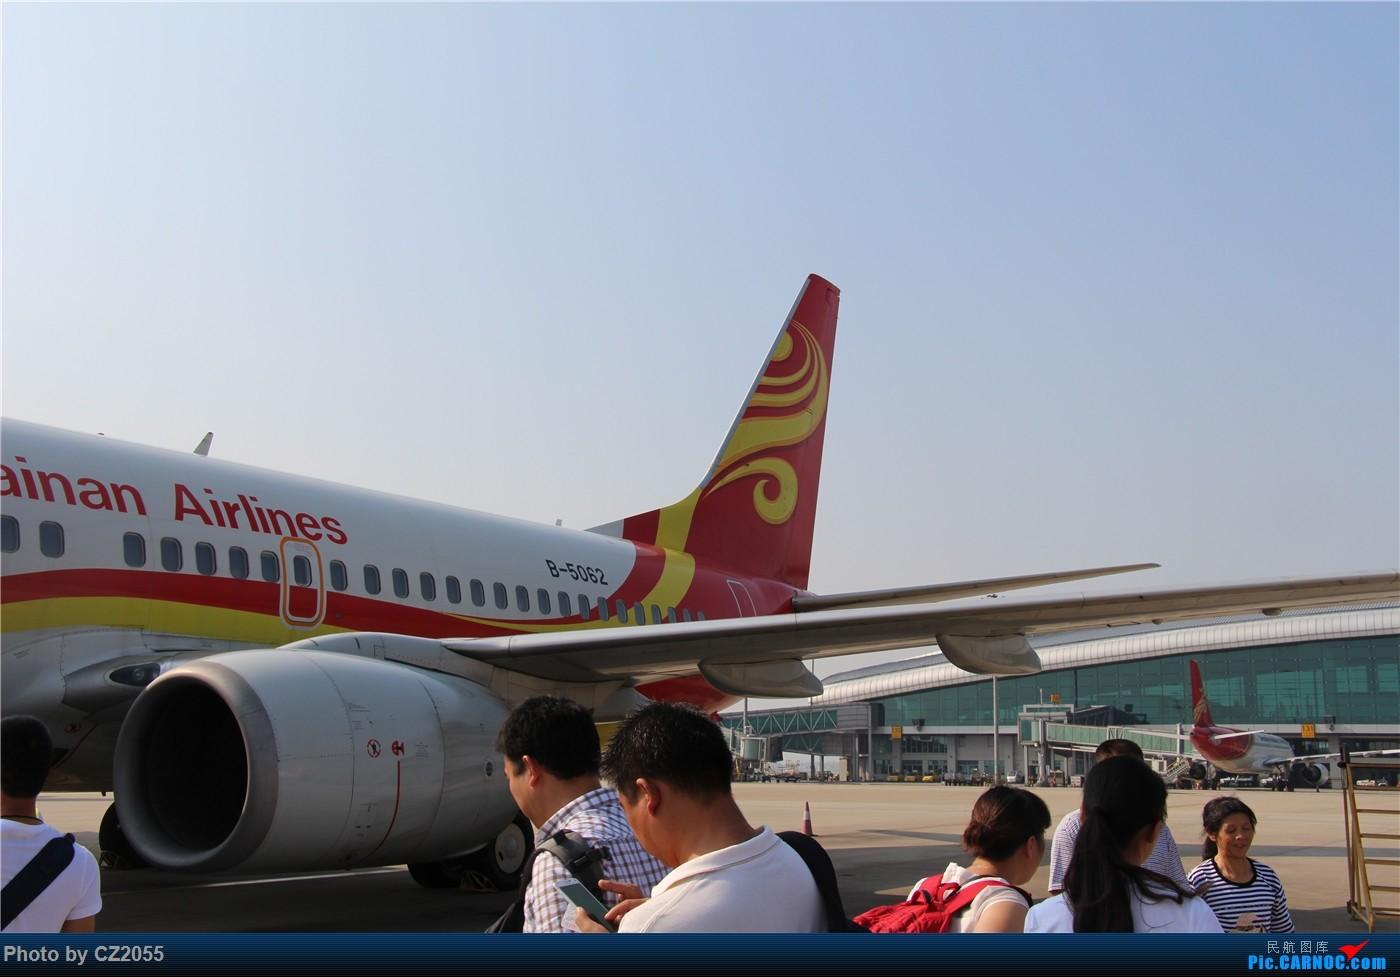 Re:[原创]【广东青少年拍机小队】【C-Z-2055(1)】Aug.8.2015 不期而遇,相伴相惜。首次体验SKYTRAX五星航空公司-海南航空。 BOEING 737-700 B-5062 中国广州白云国际机场